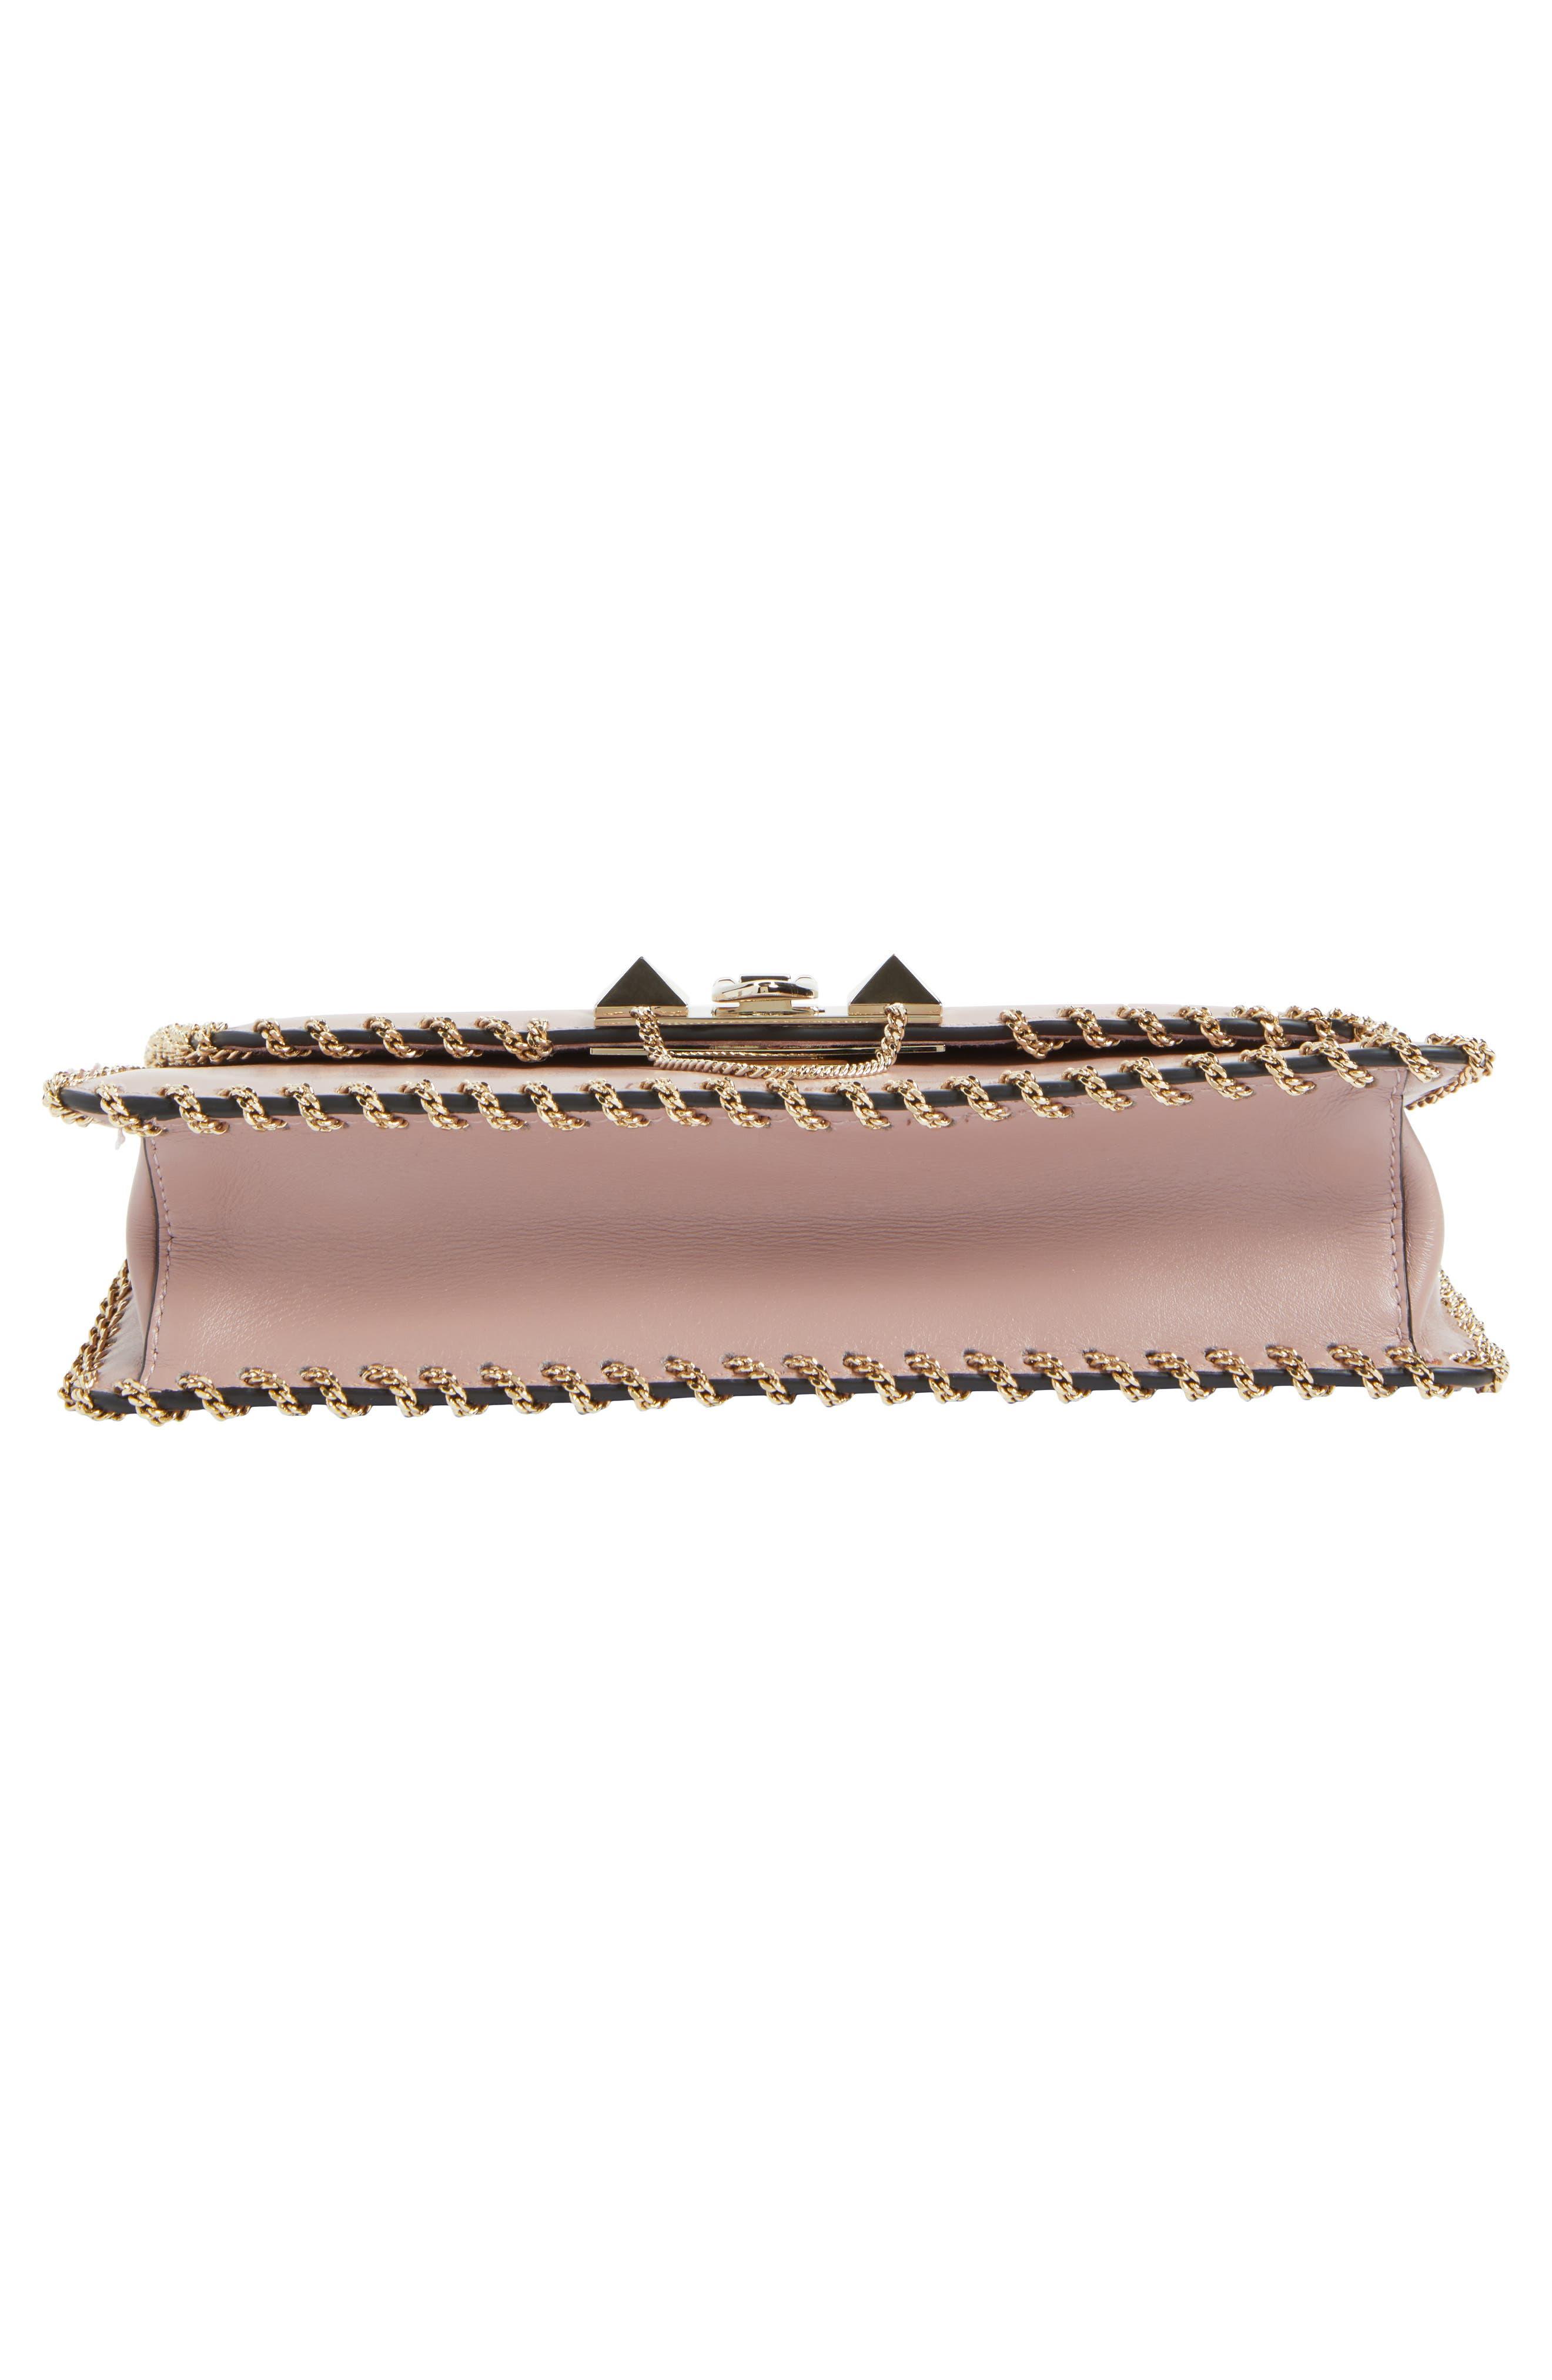 Demilune Whipstitch Leather Shoulder Bag,                             Alternate thumbnail 5, color,                             Lipstick